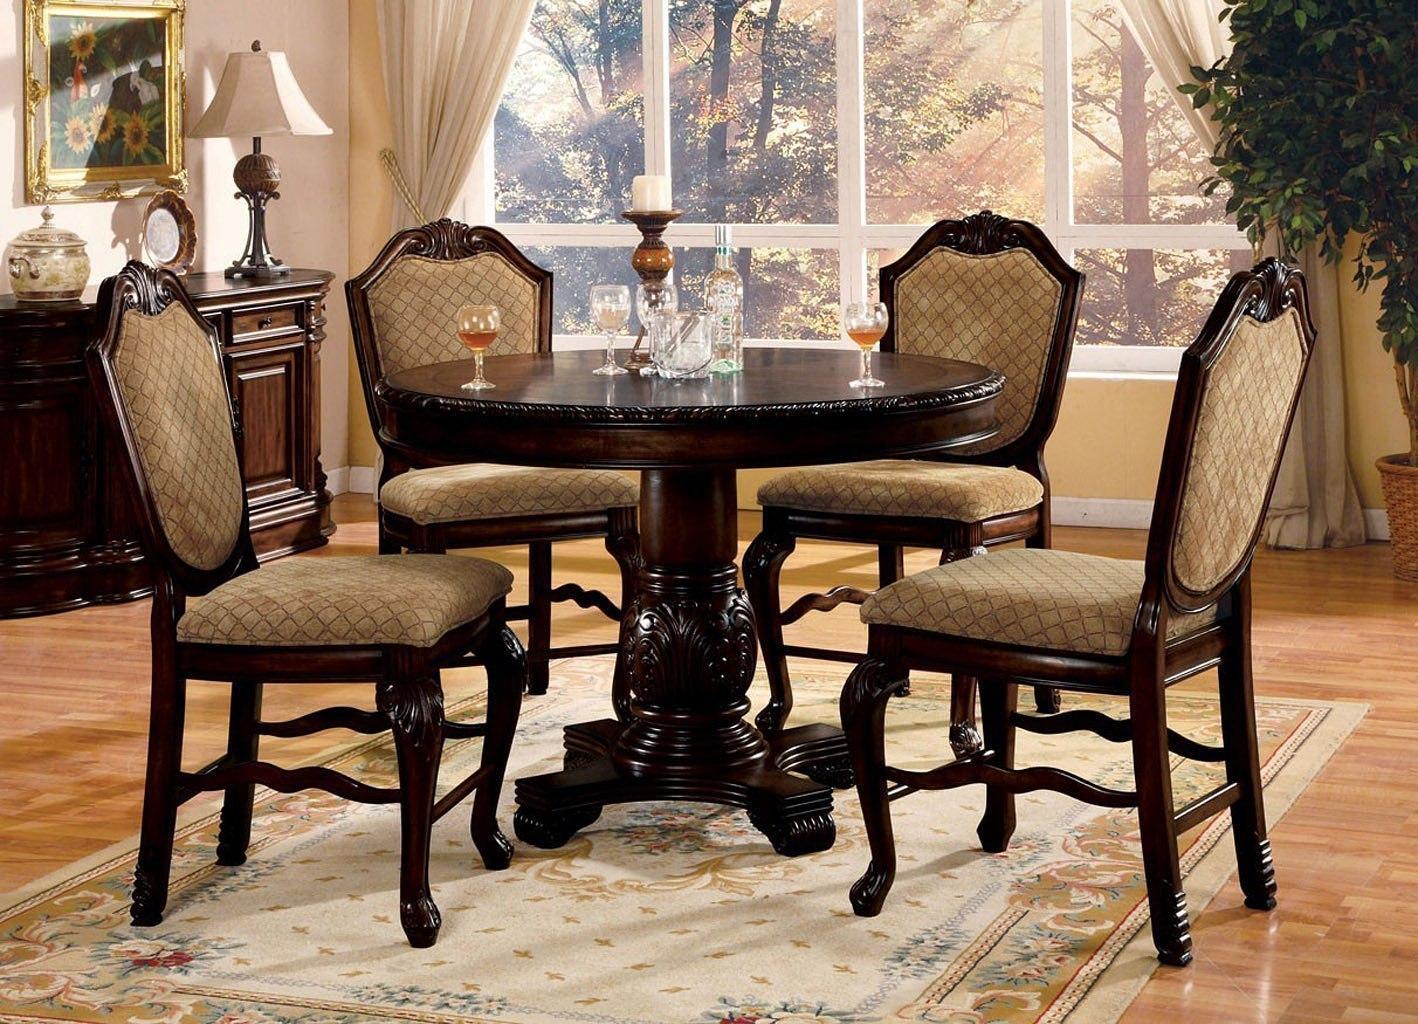 Chateau De Ville Counter Height Dining Set (Espresso)